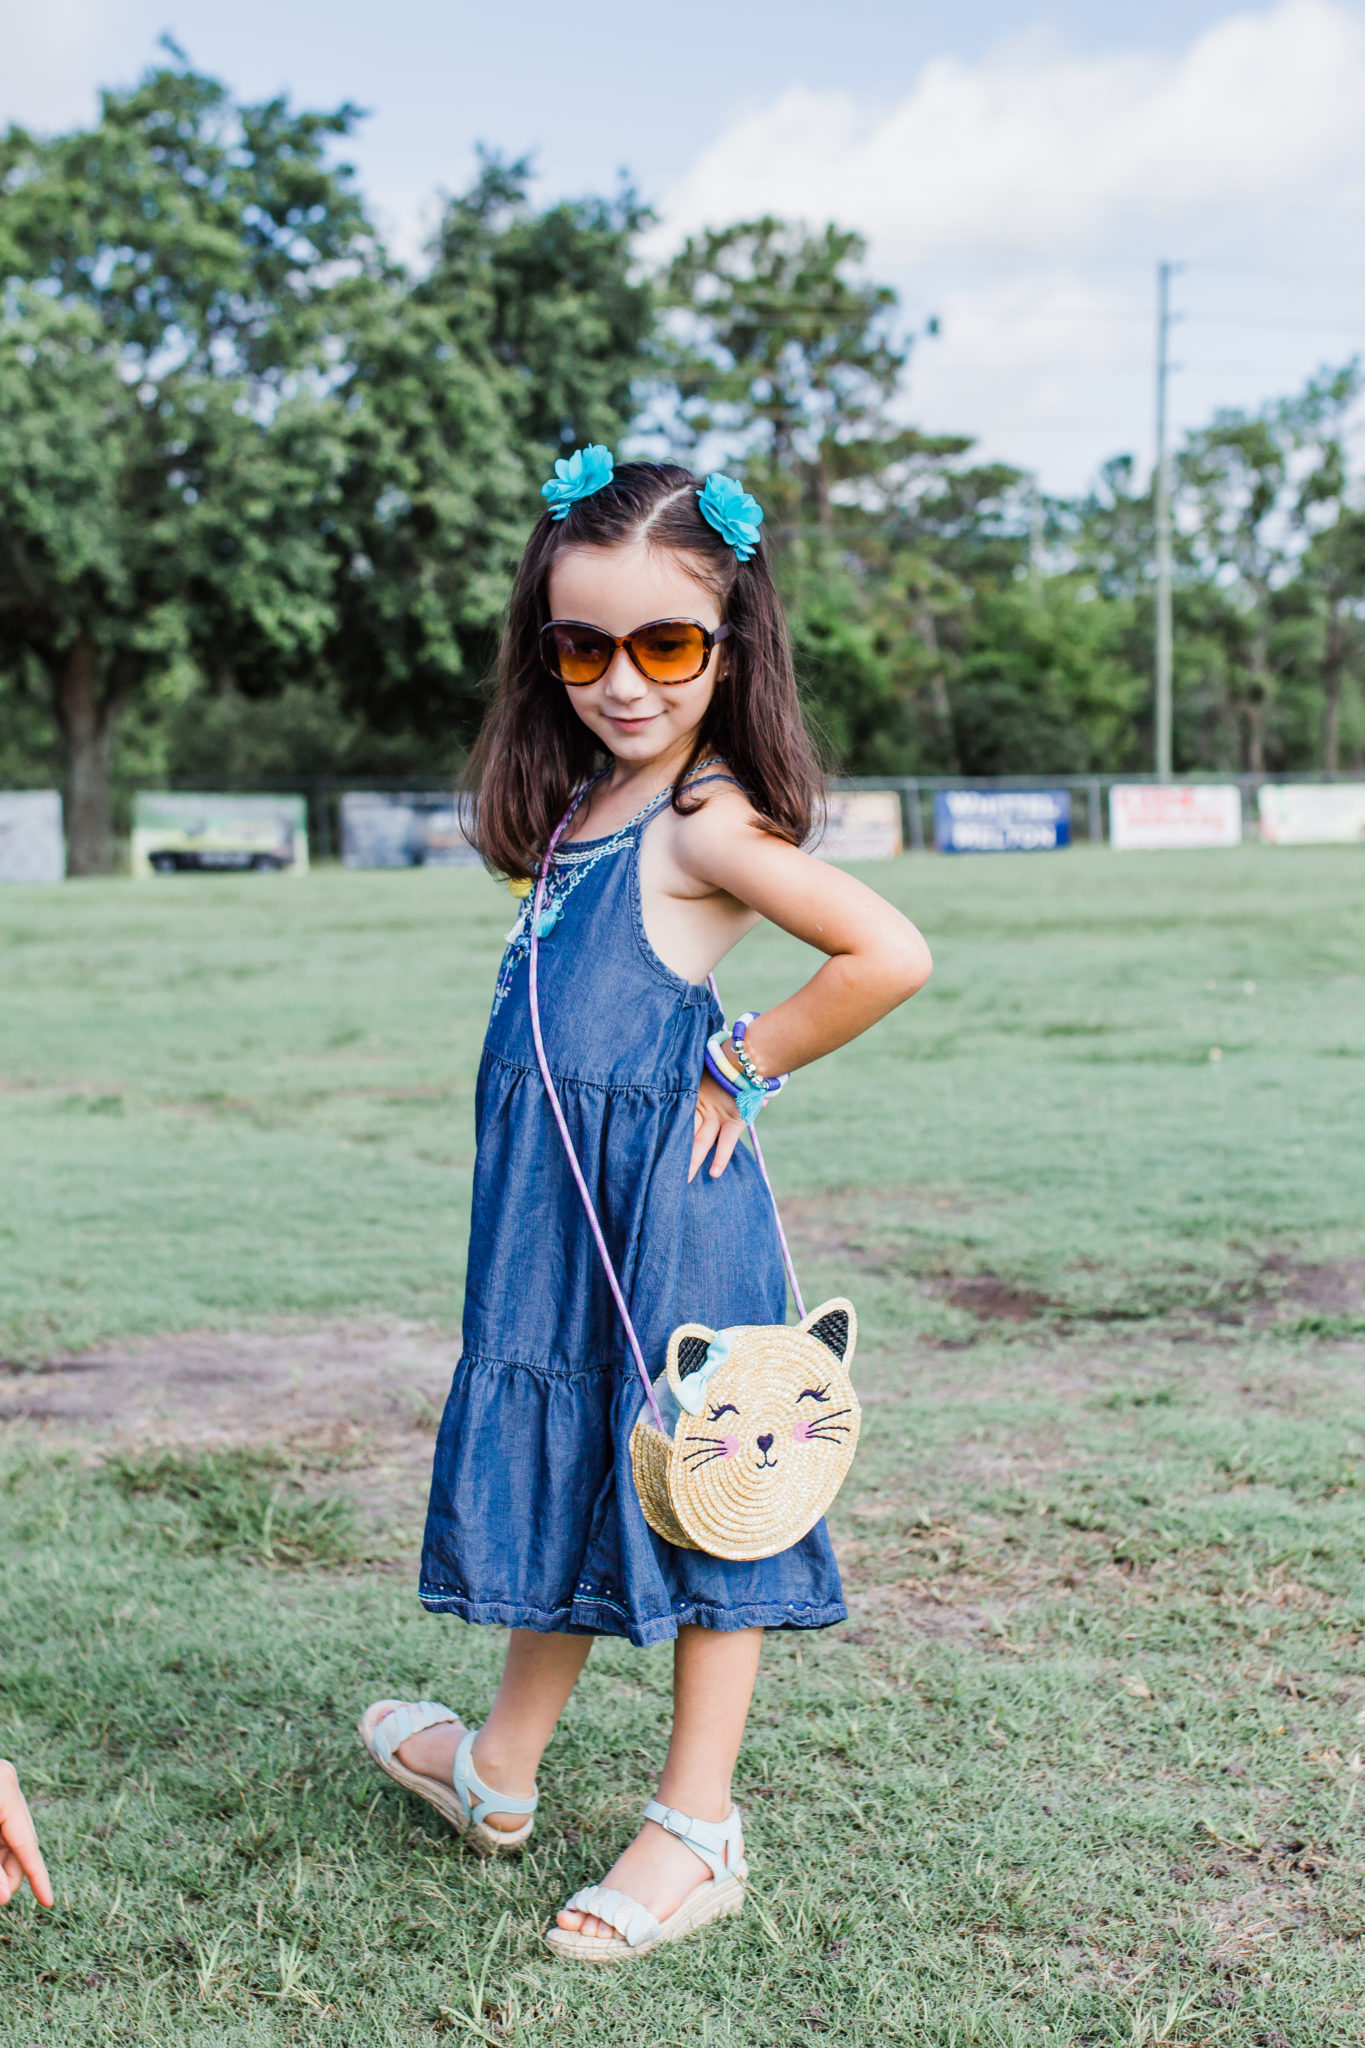 toddler summer fashion, toddler boy style, gymboree summer collection, toddler girl summer clothes, 5 year old girl fashion